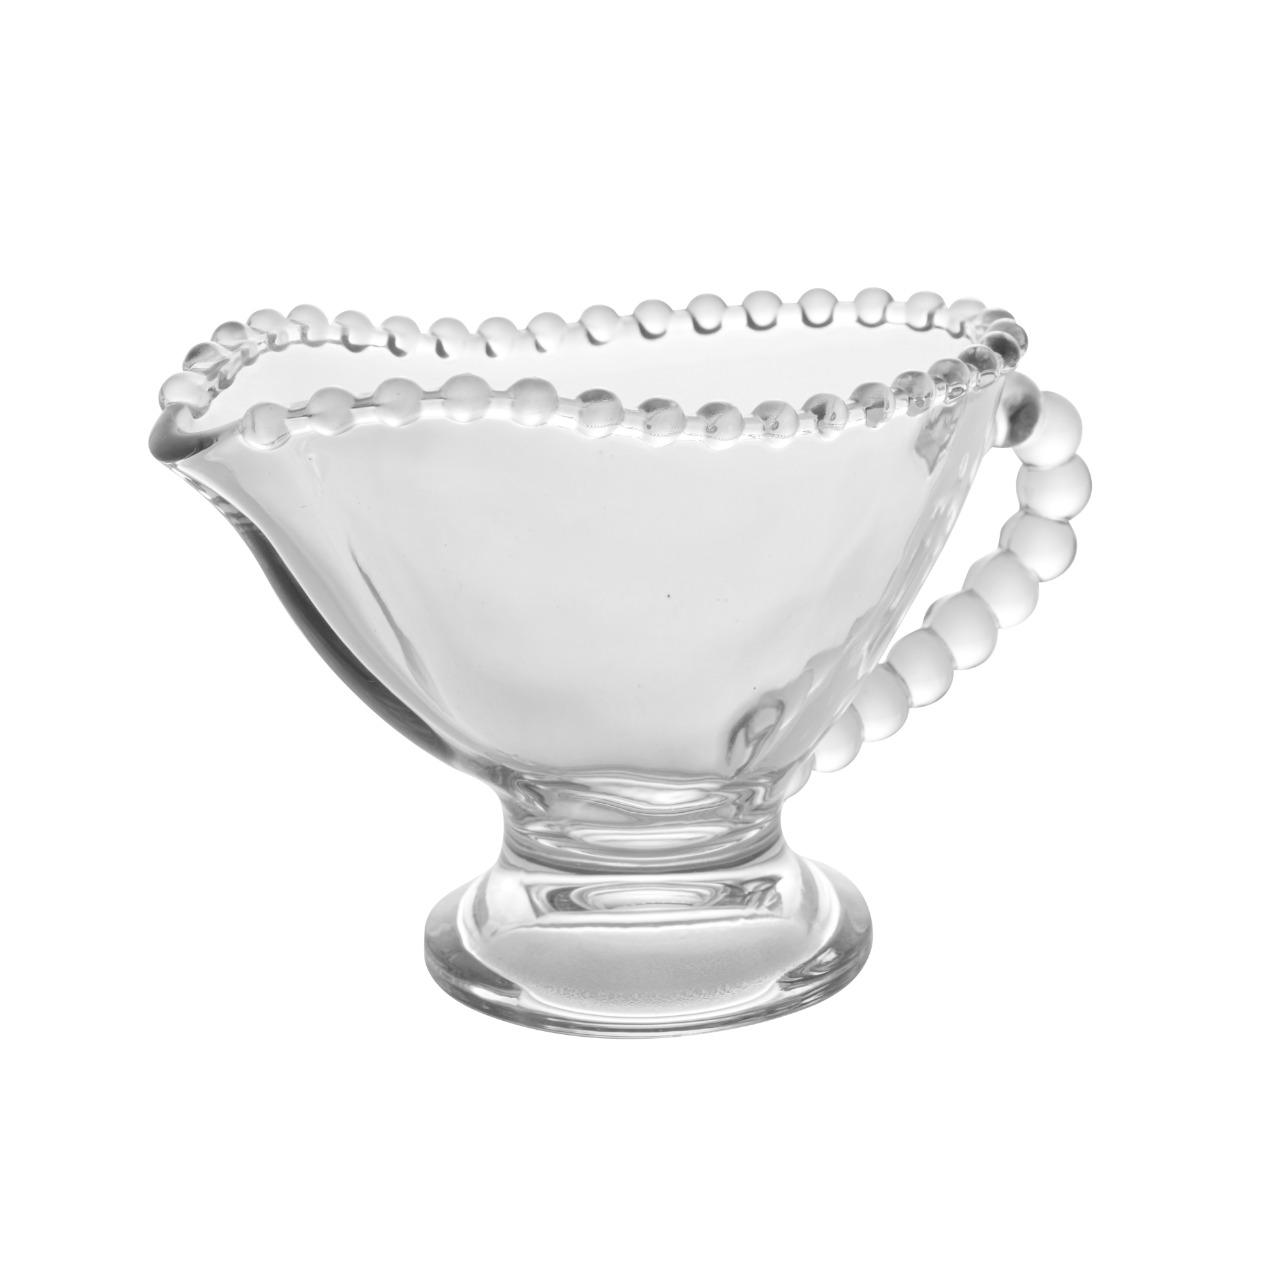 Molheira Cristal Pearl 140ml - Wolff